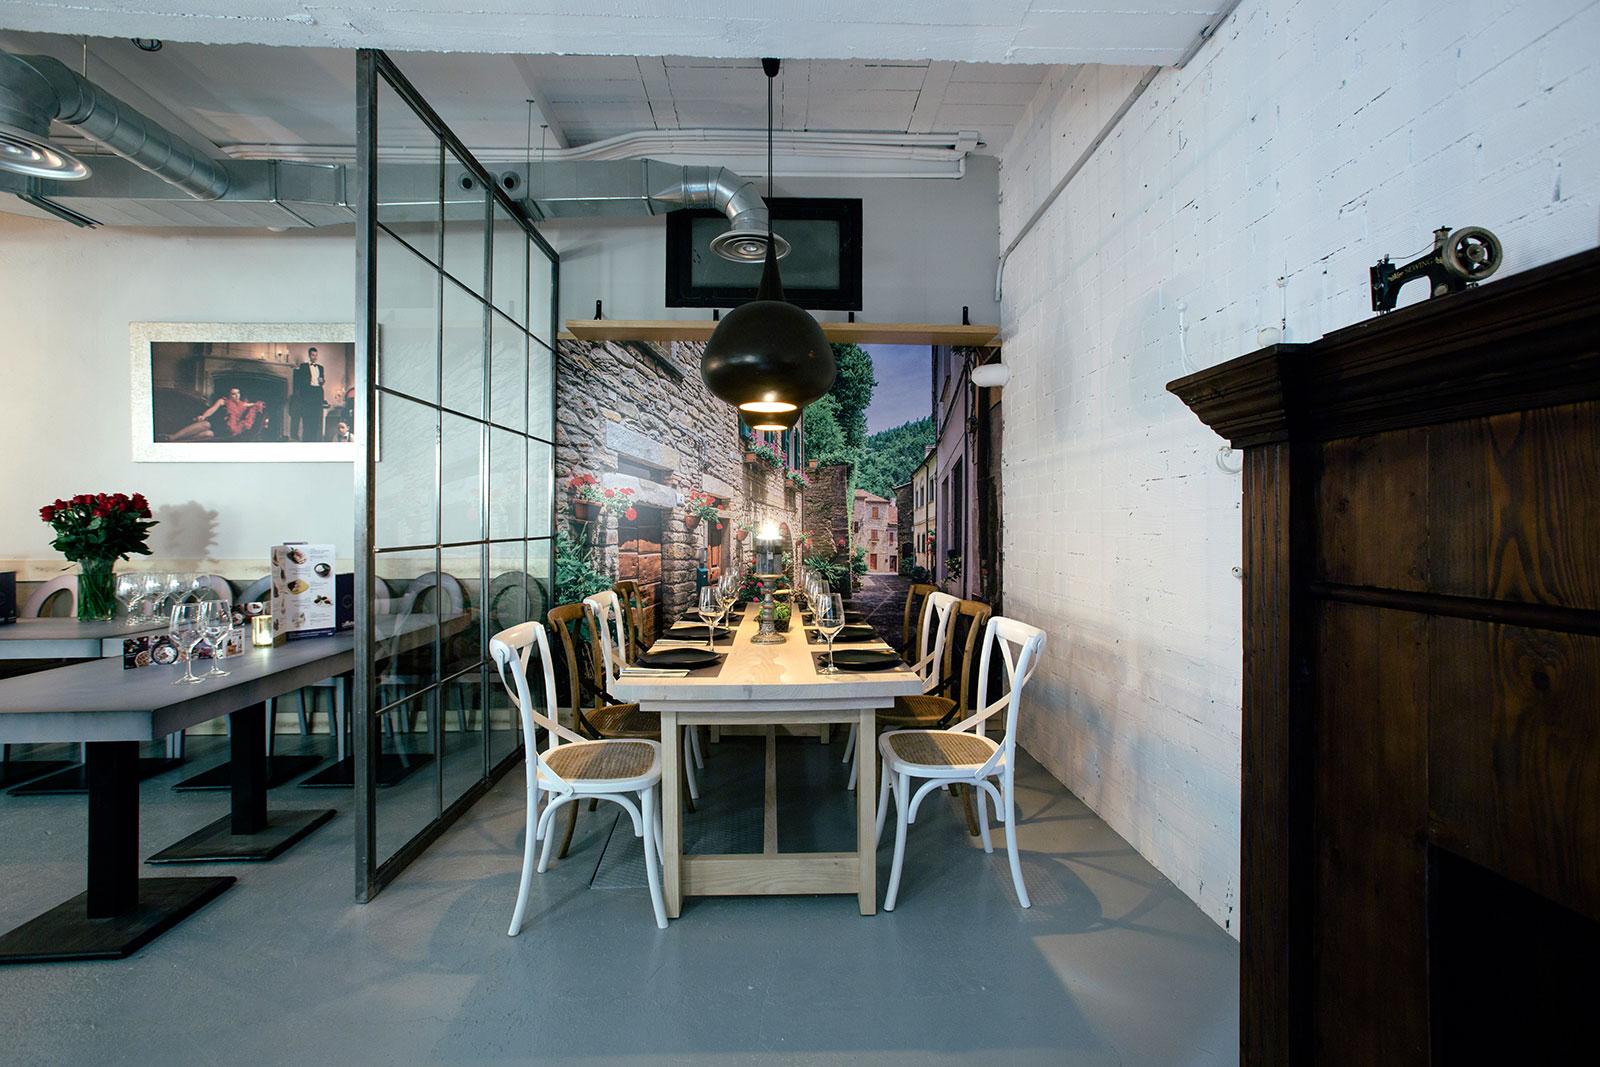 IK7A5029 - La Mafia se sienta a la mesa no para de crecer. Abre restaurante en San Sebastian